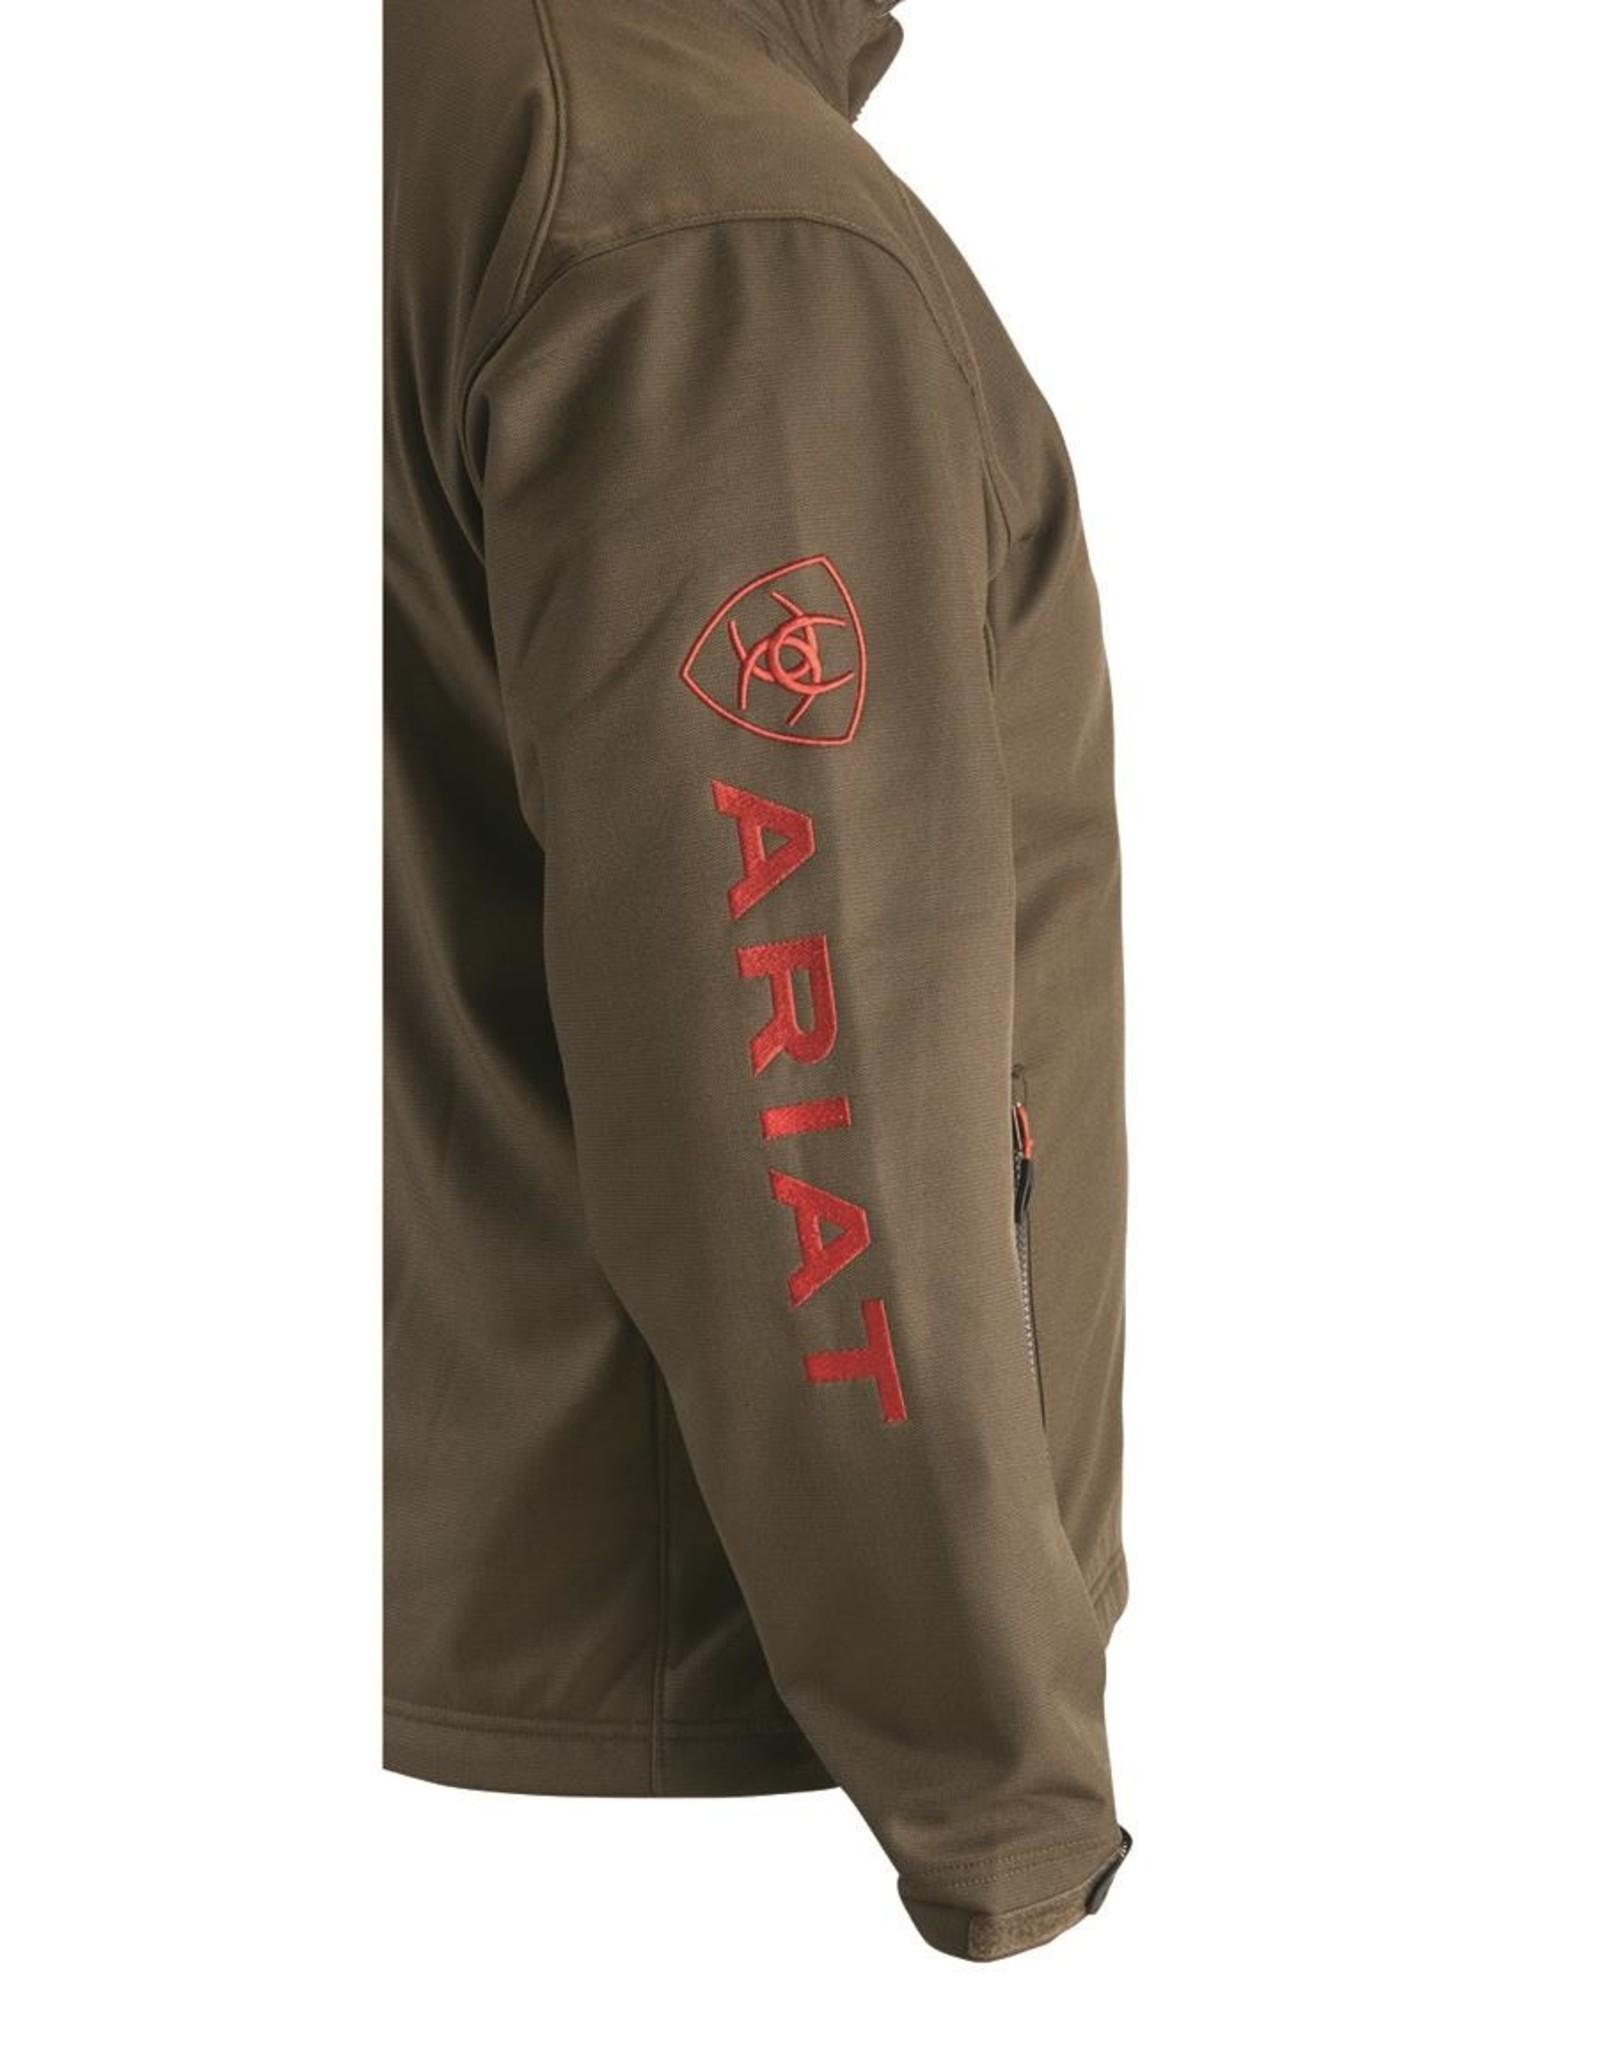 Ariat Men's Logo 2.0 Soft Shell Jacket